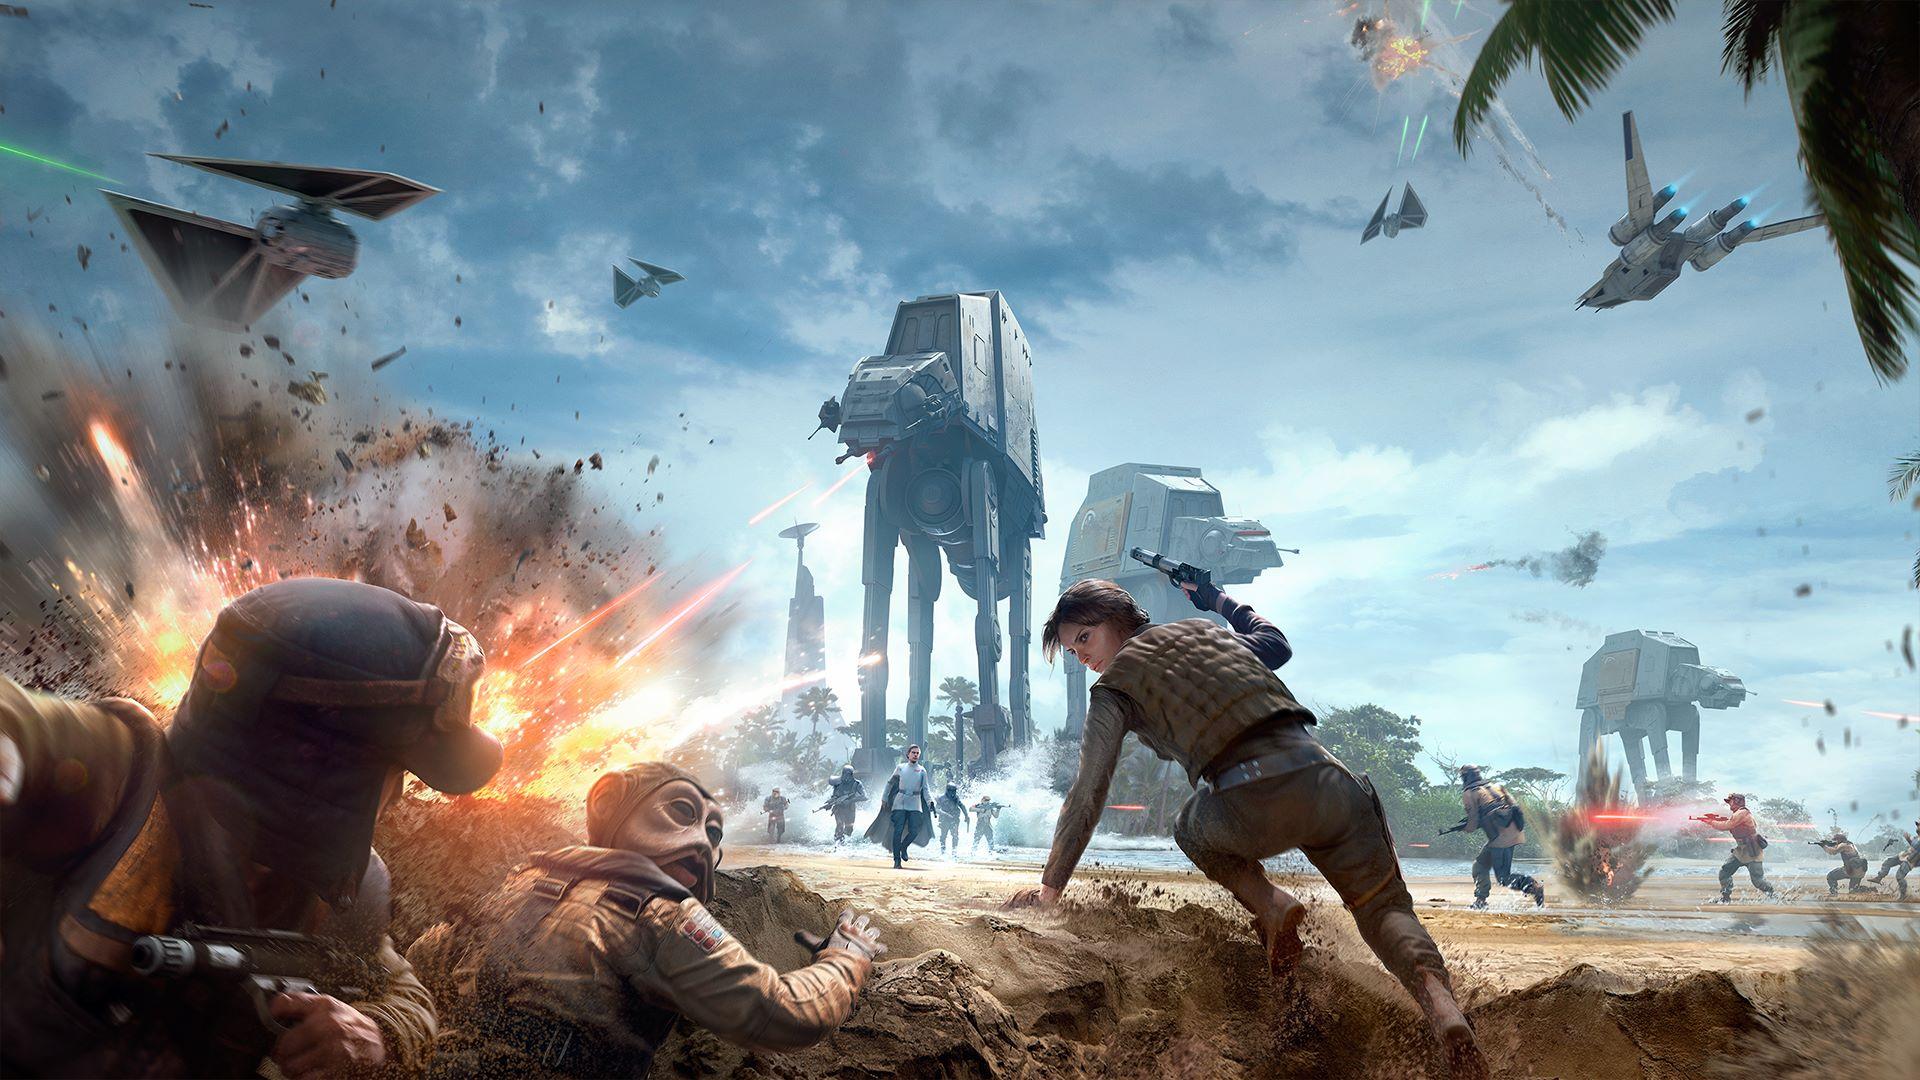 Star Wars Games Quantic Dream